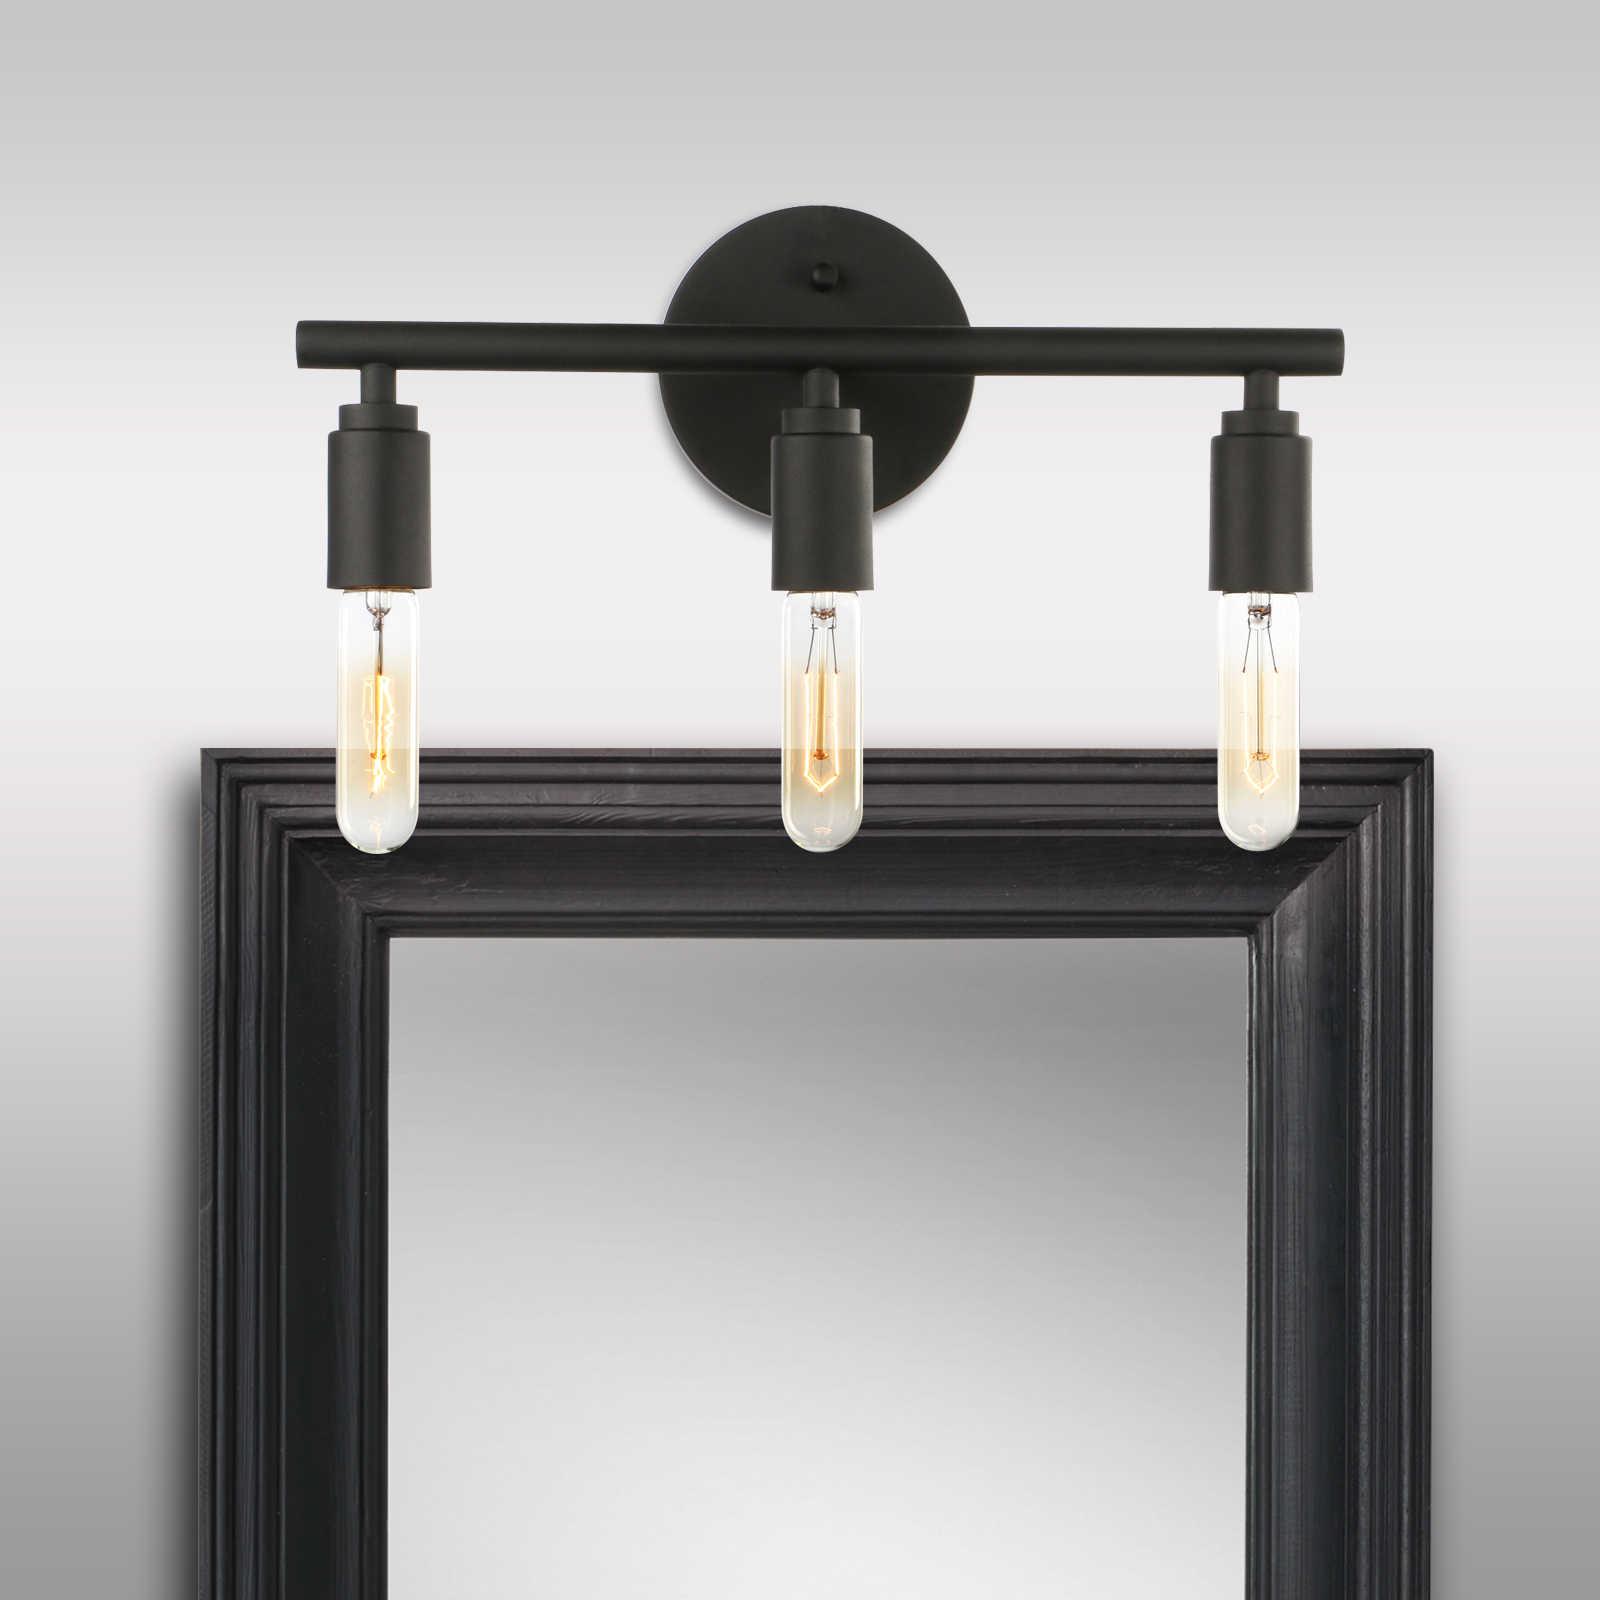 Permo 3 Light Sconce Light Matte Black Simplicity Bathroom Vanity Light Bedroom Wall Light Wall Lamps Aliexpress